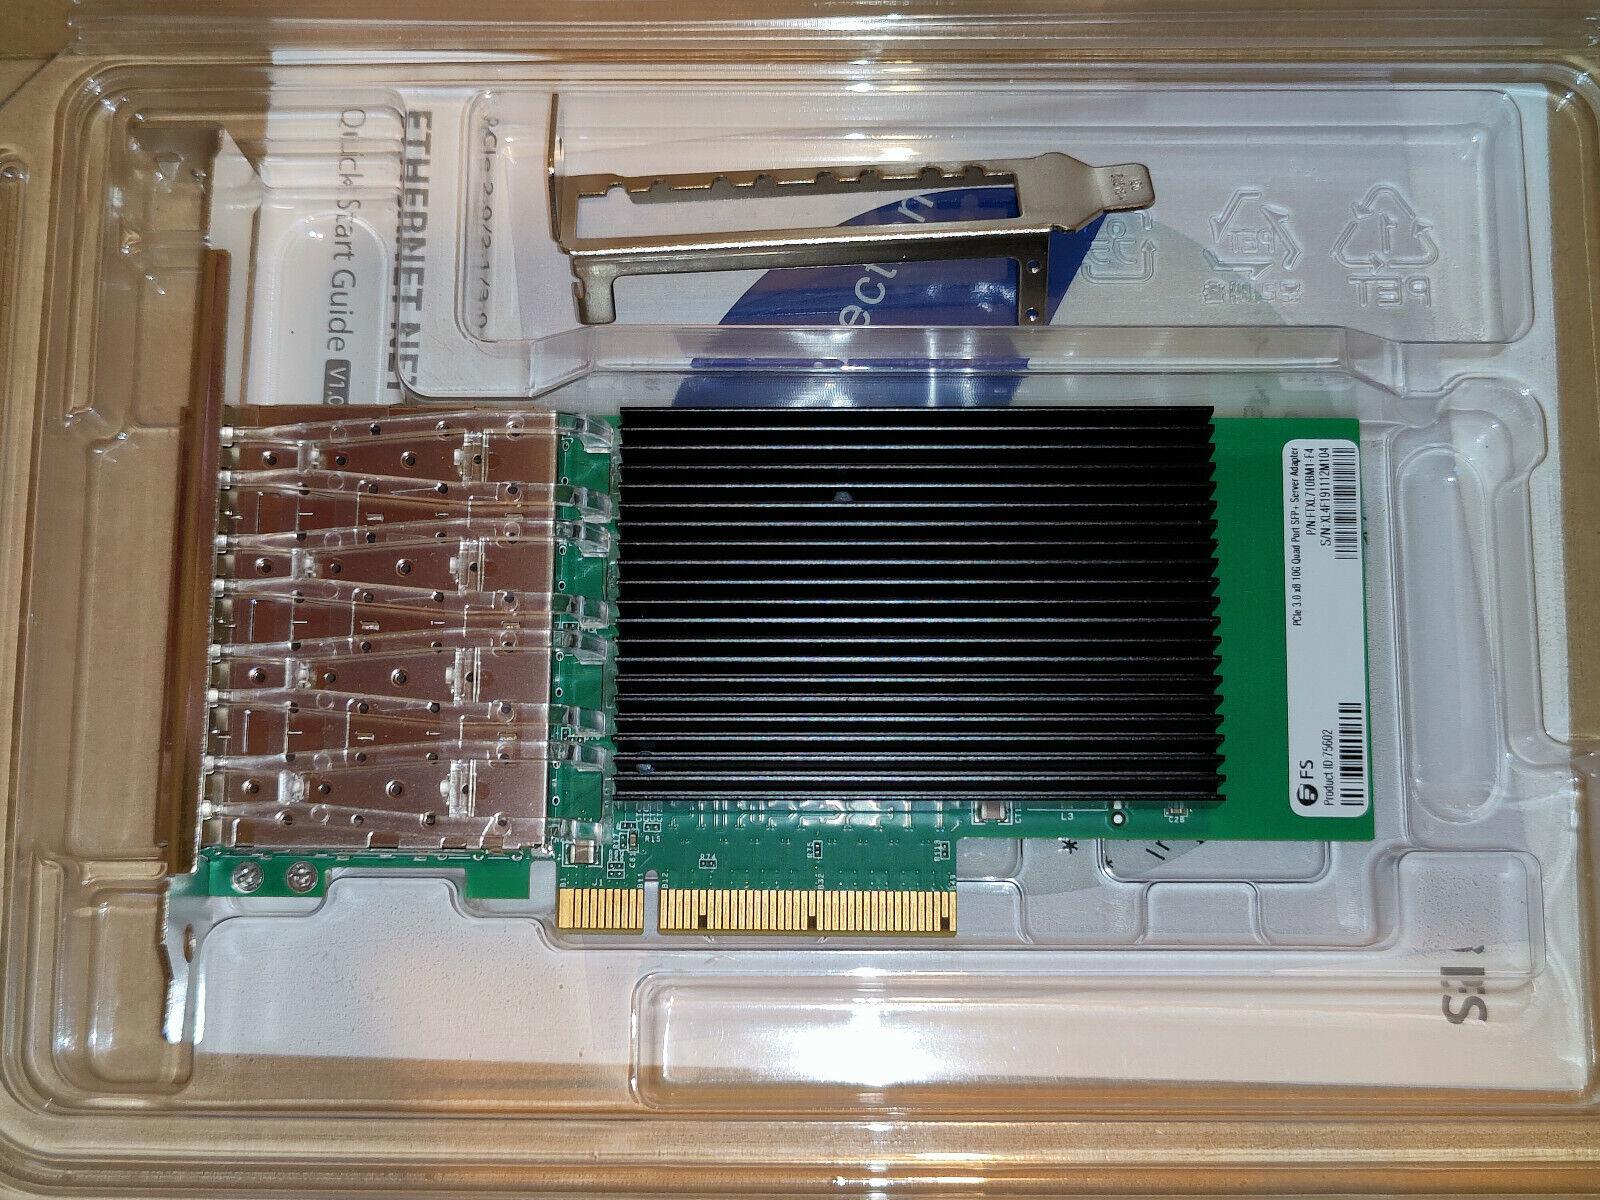 Intel XL710-BM1-Based Ethernet Network Interface Card, 10G Quad-Port SFP+, PCIe